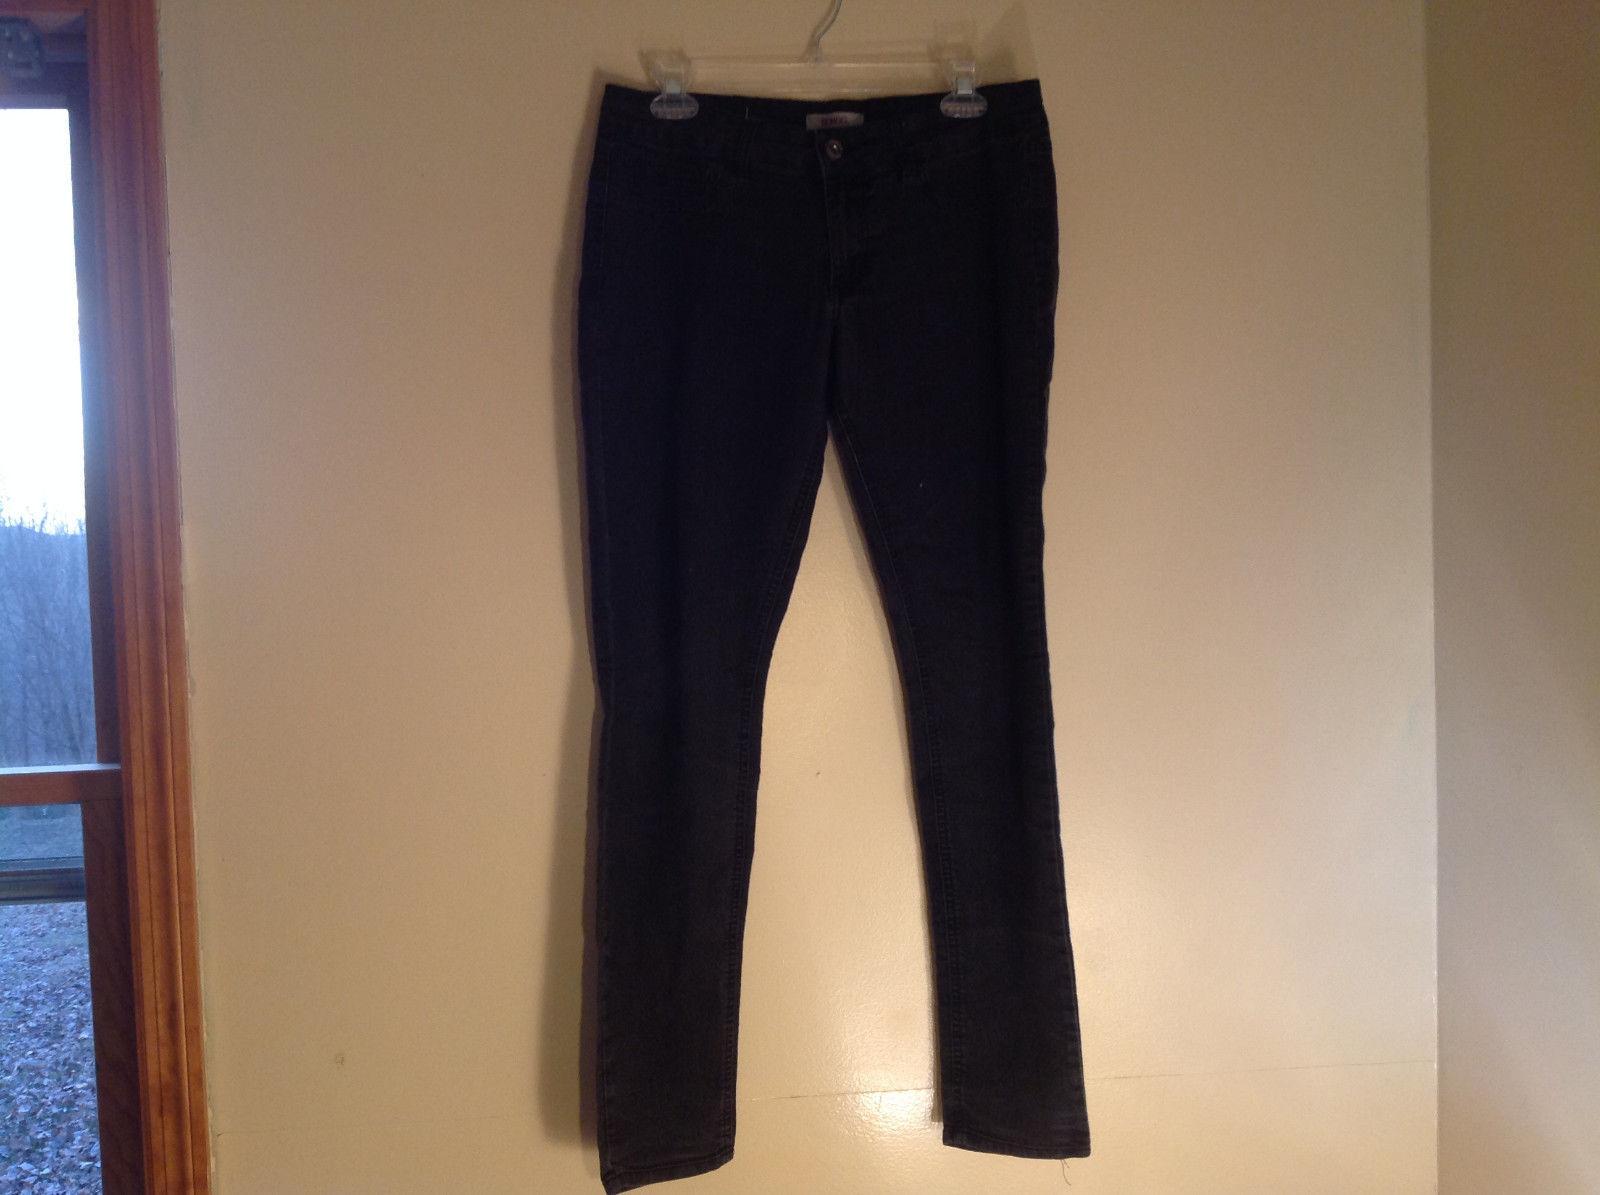 Bongo Black Skinny Leg Jeans Color Looks Worn Size 11